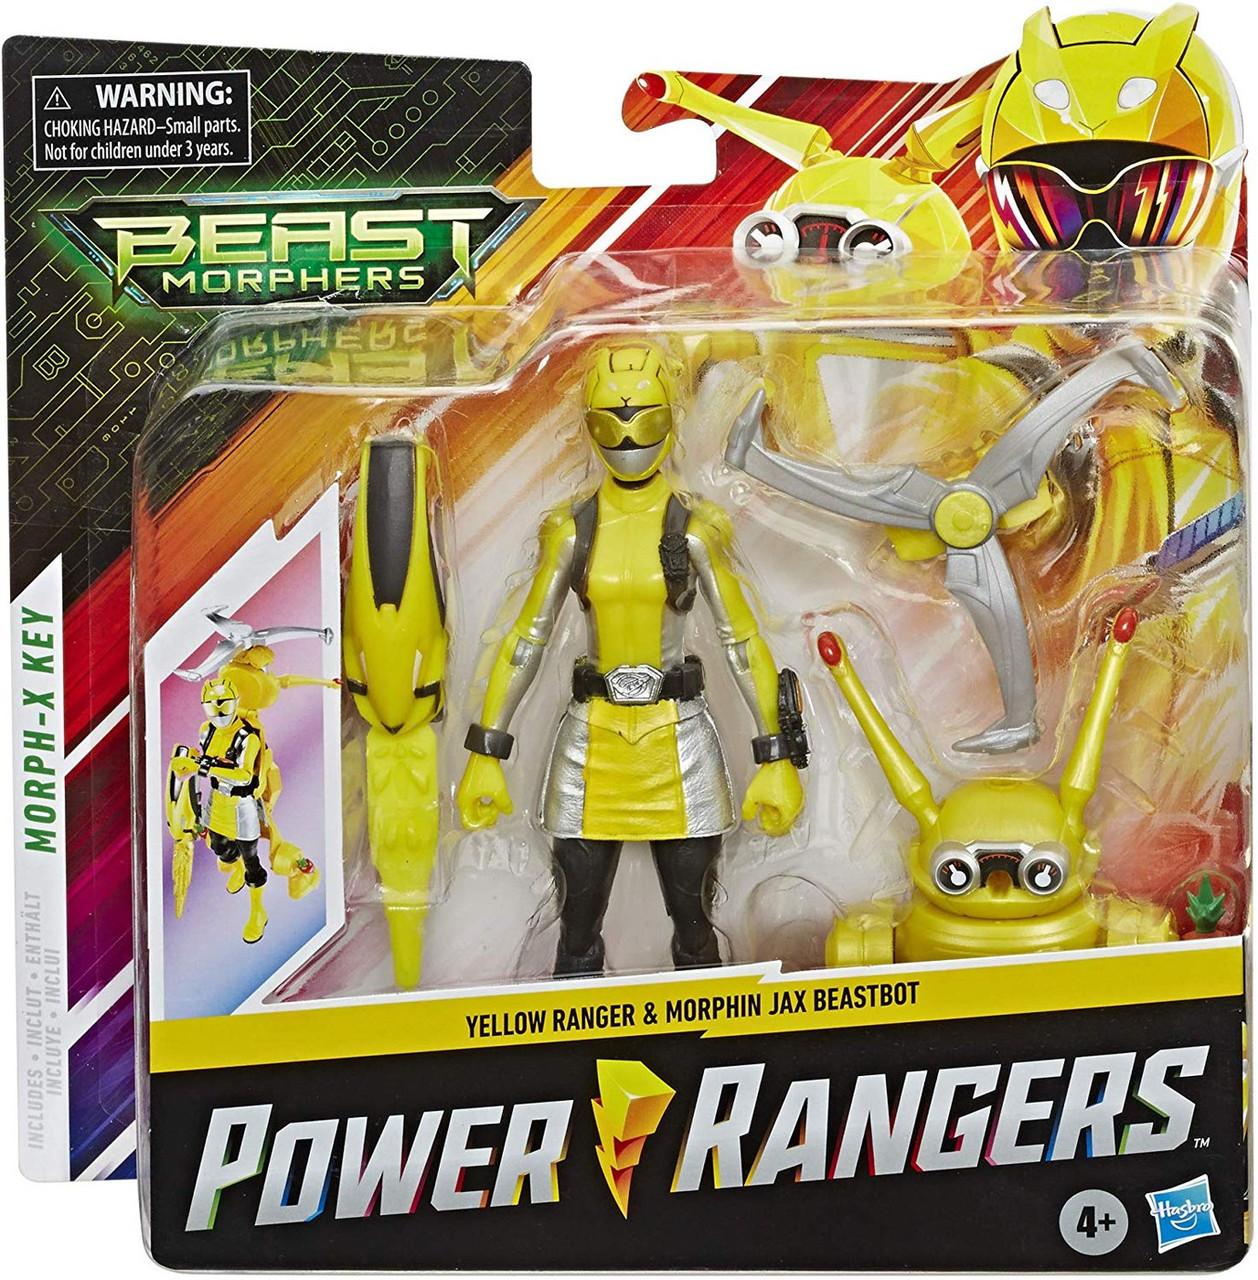 Power Rangers Beast Morphers Yellow Ranger Morphin Jax Beastbot